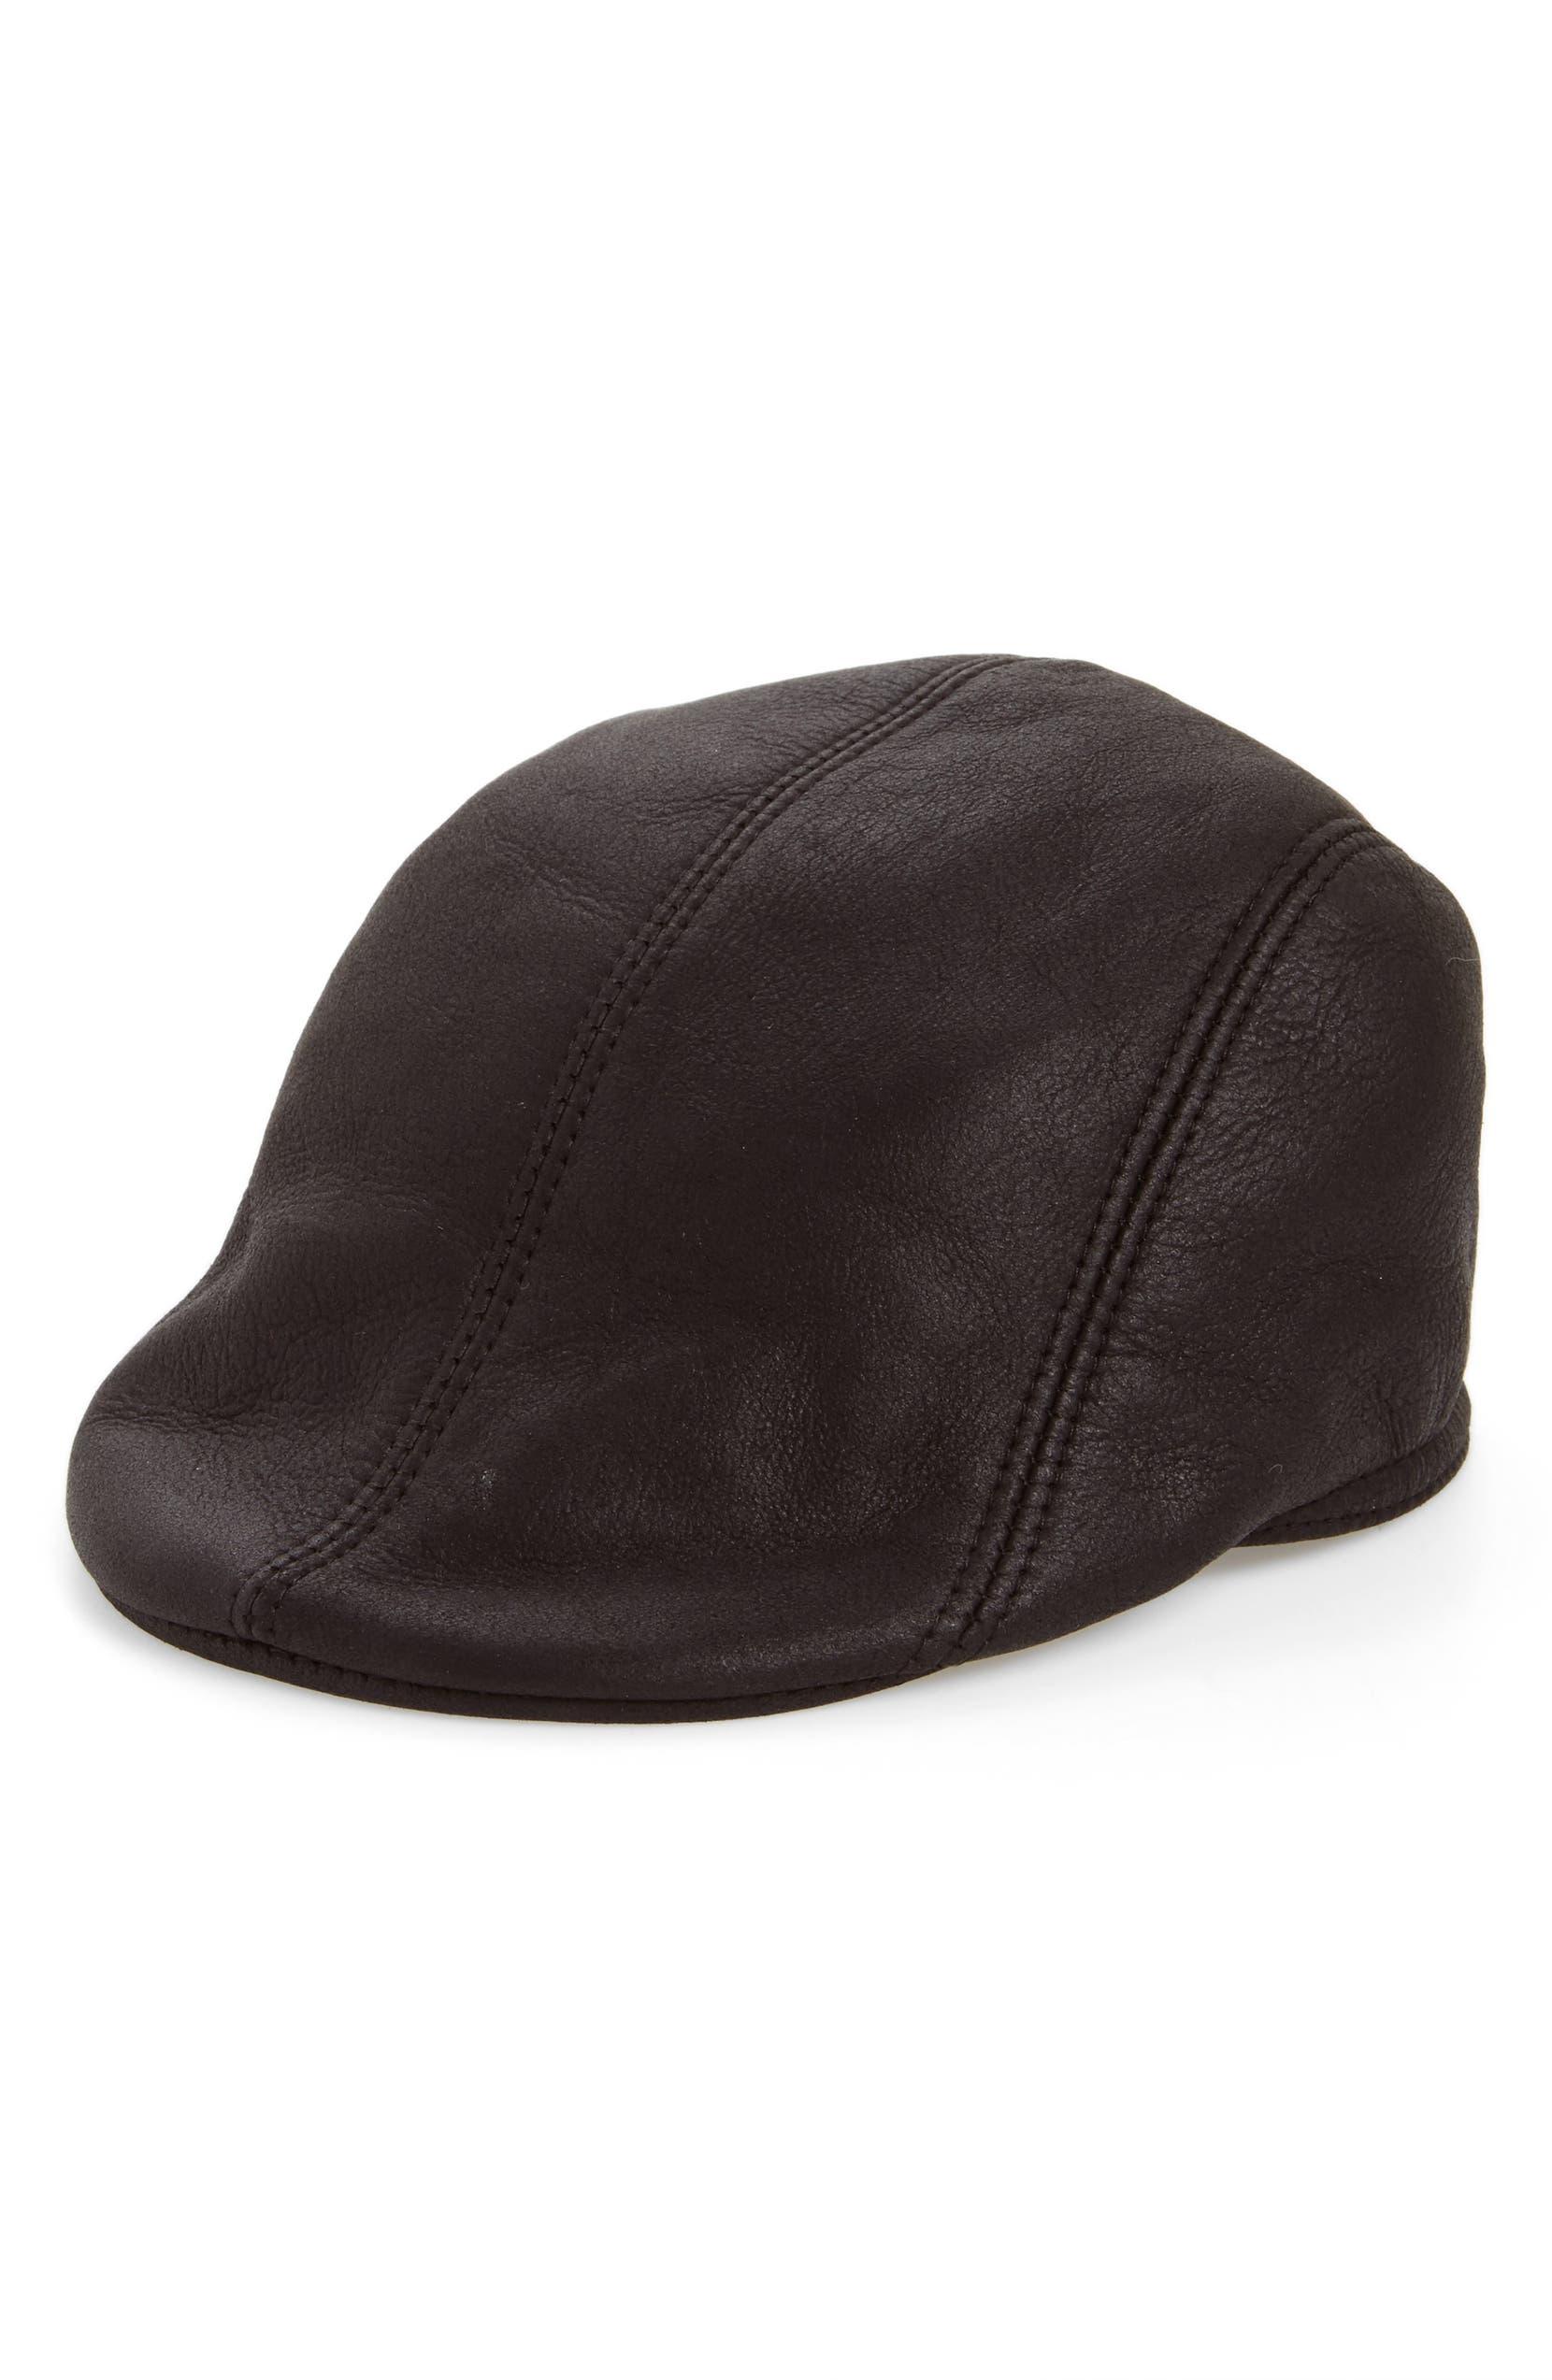 efe6f7b92c5 Crown Cap Genuine Shearling Leather Driving Cap